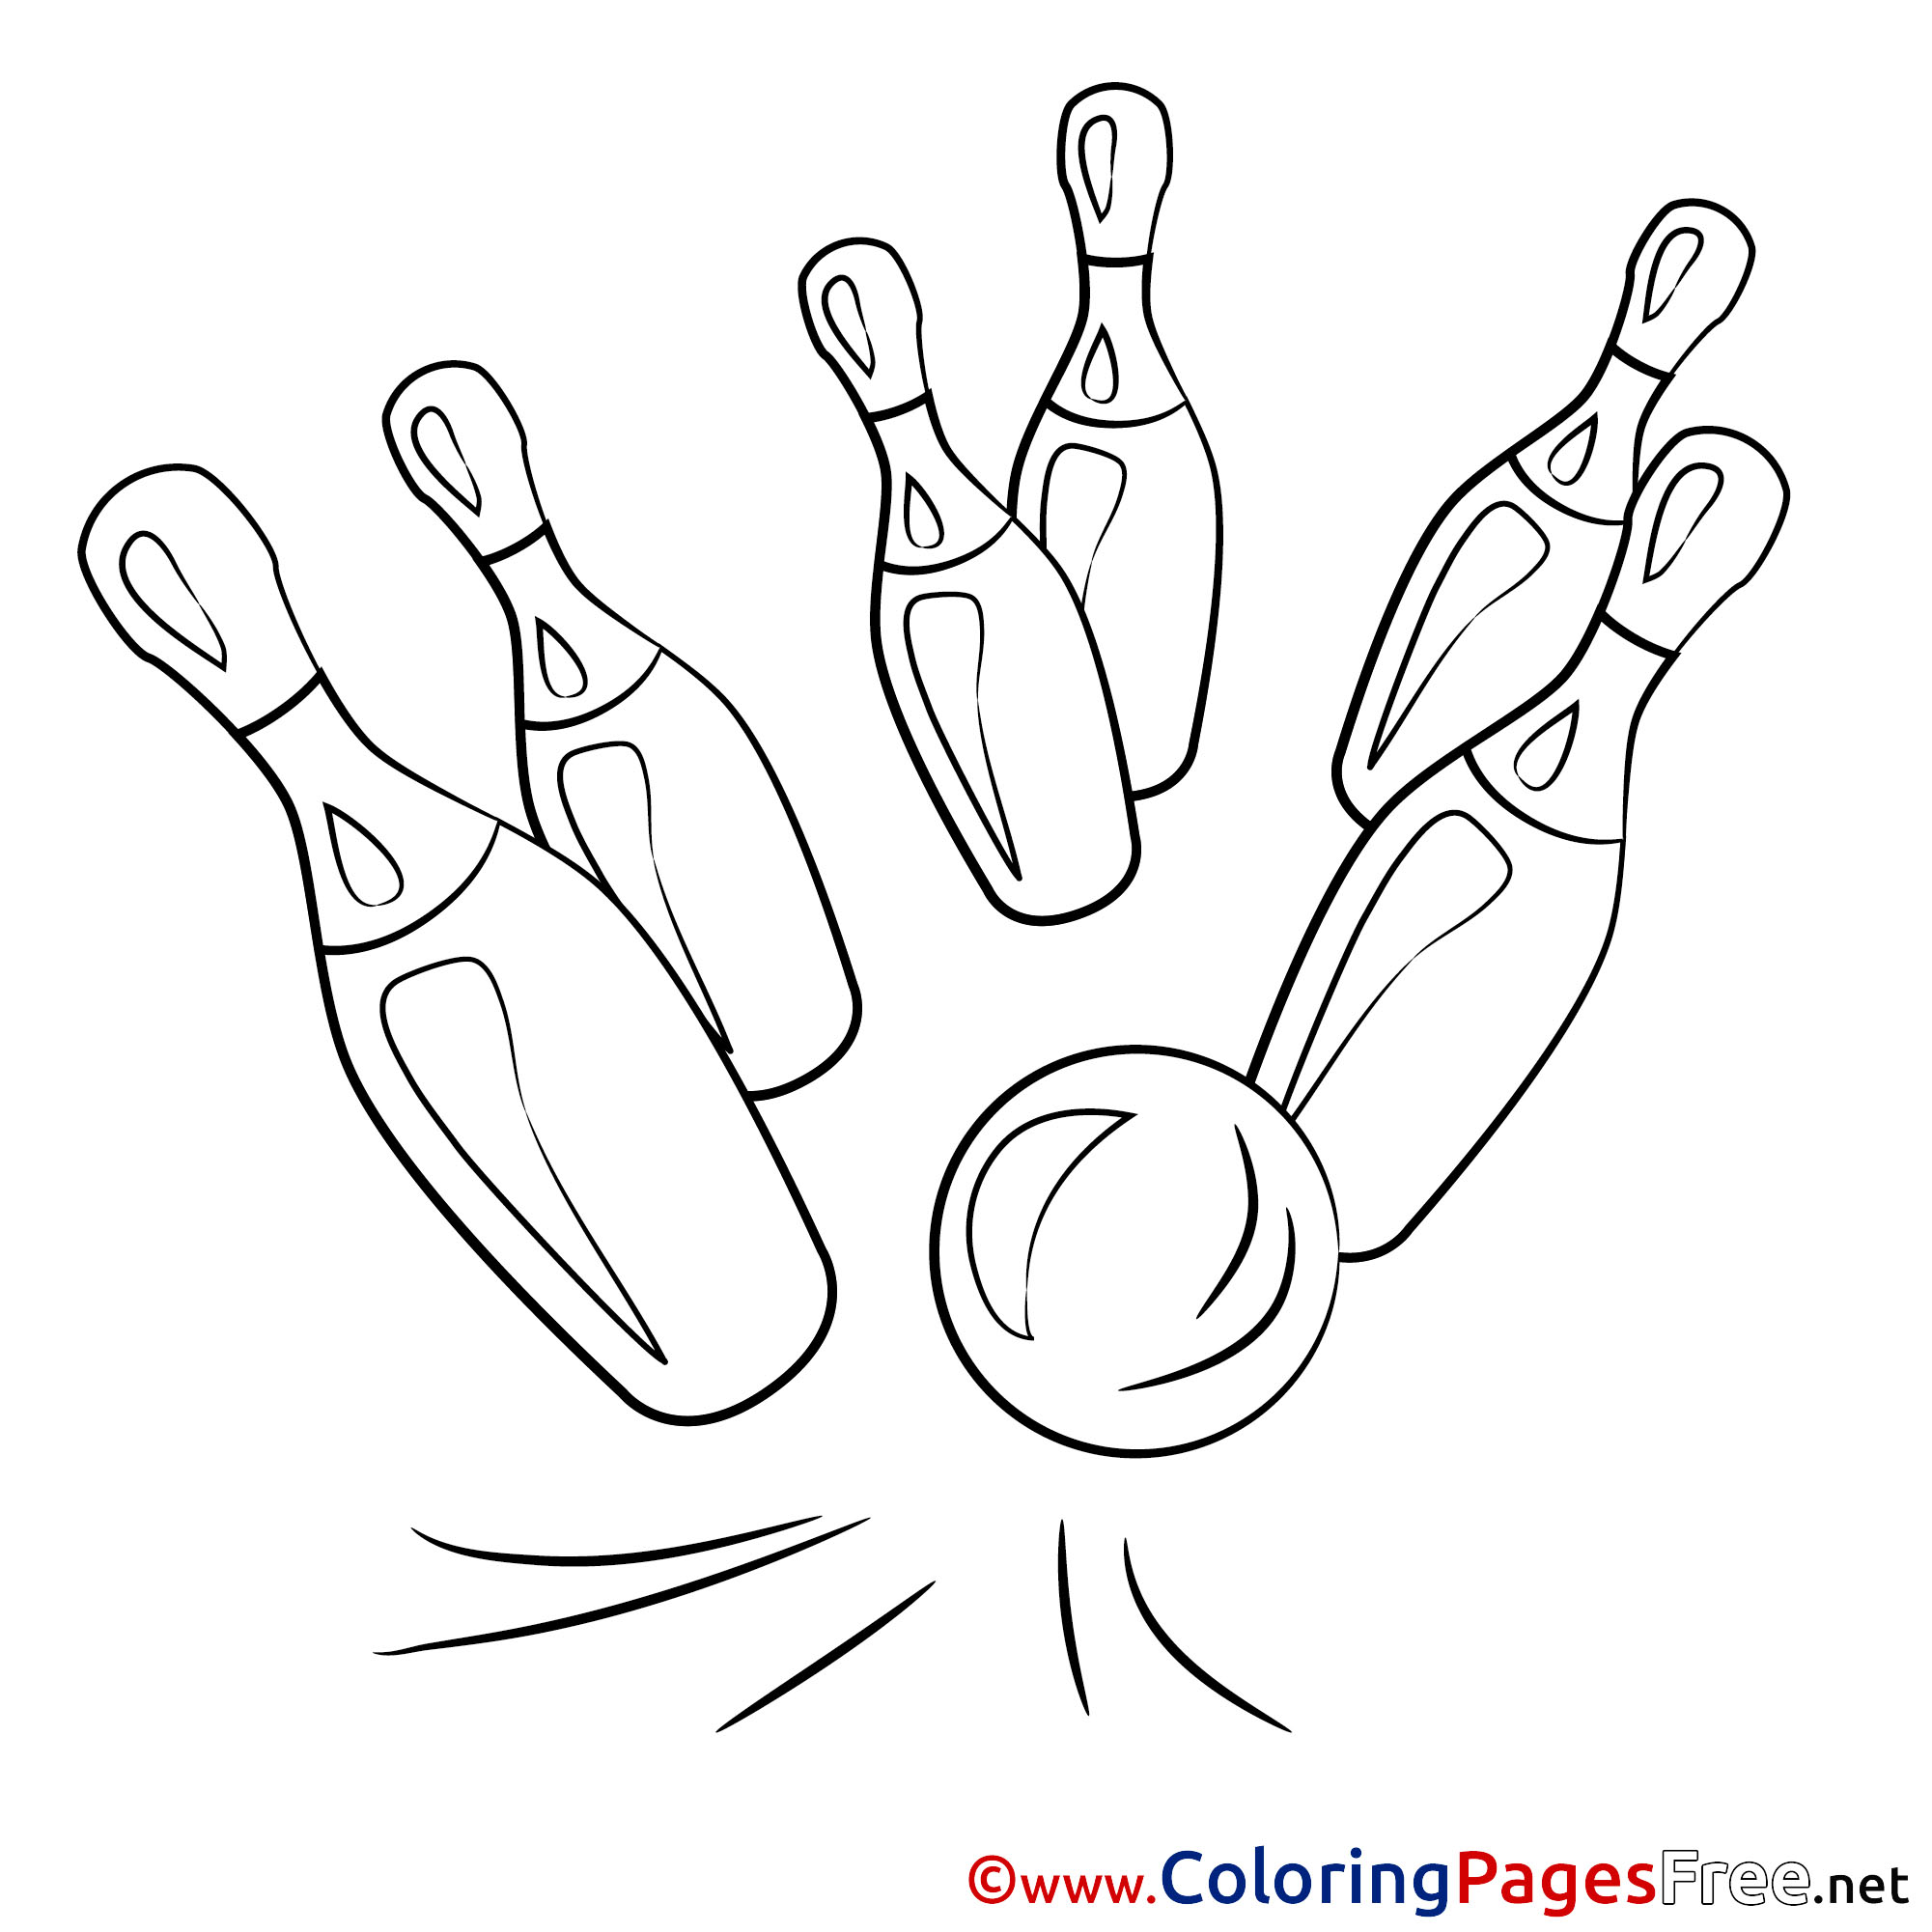 Bowling Pin Coloring Page | 2001x2001